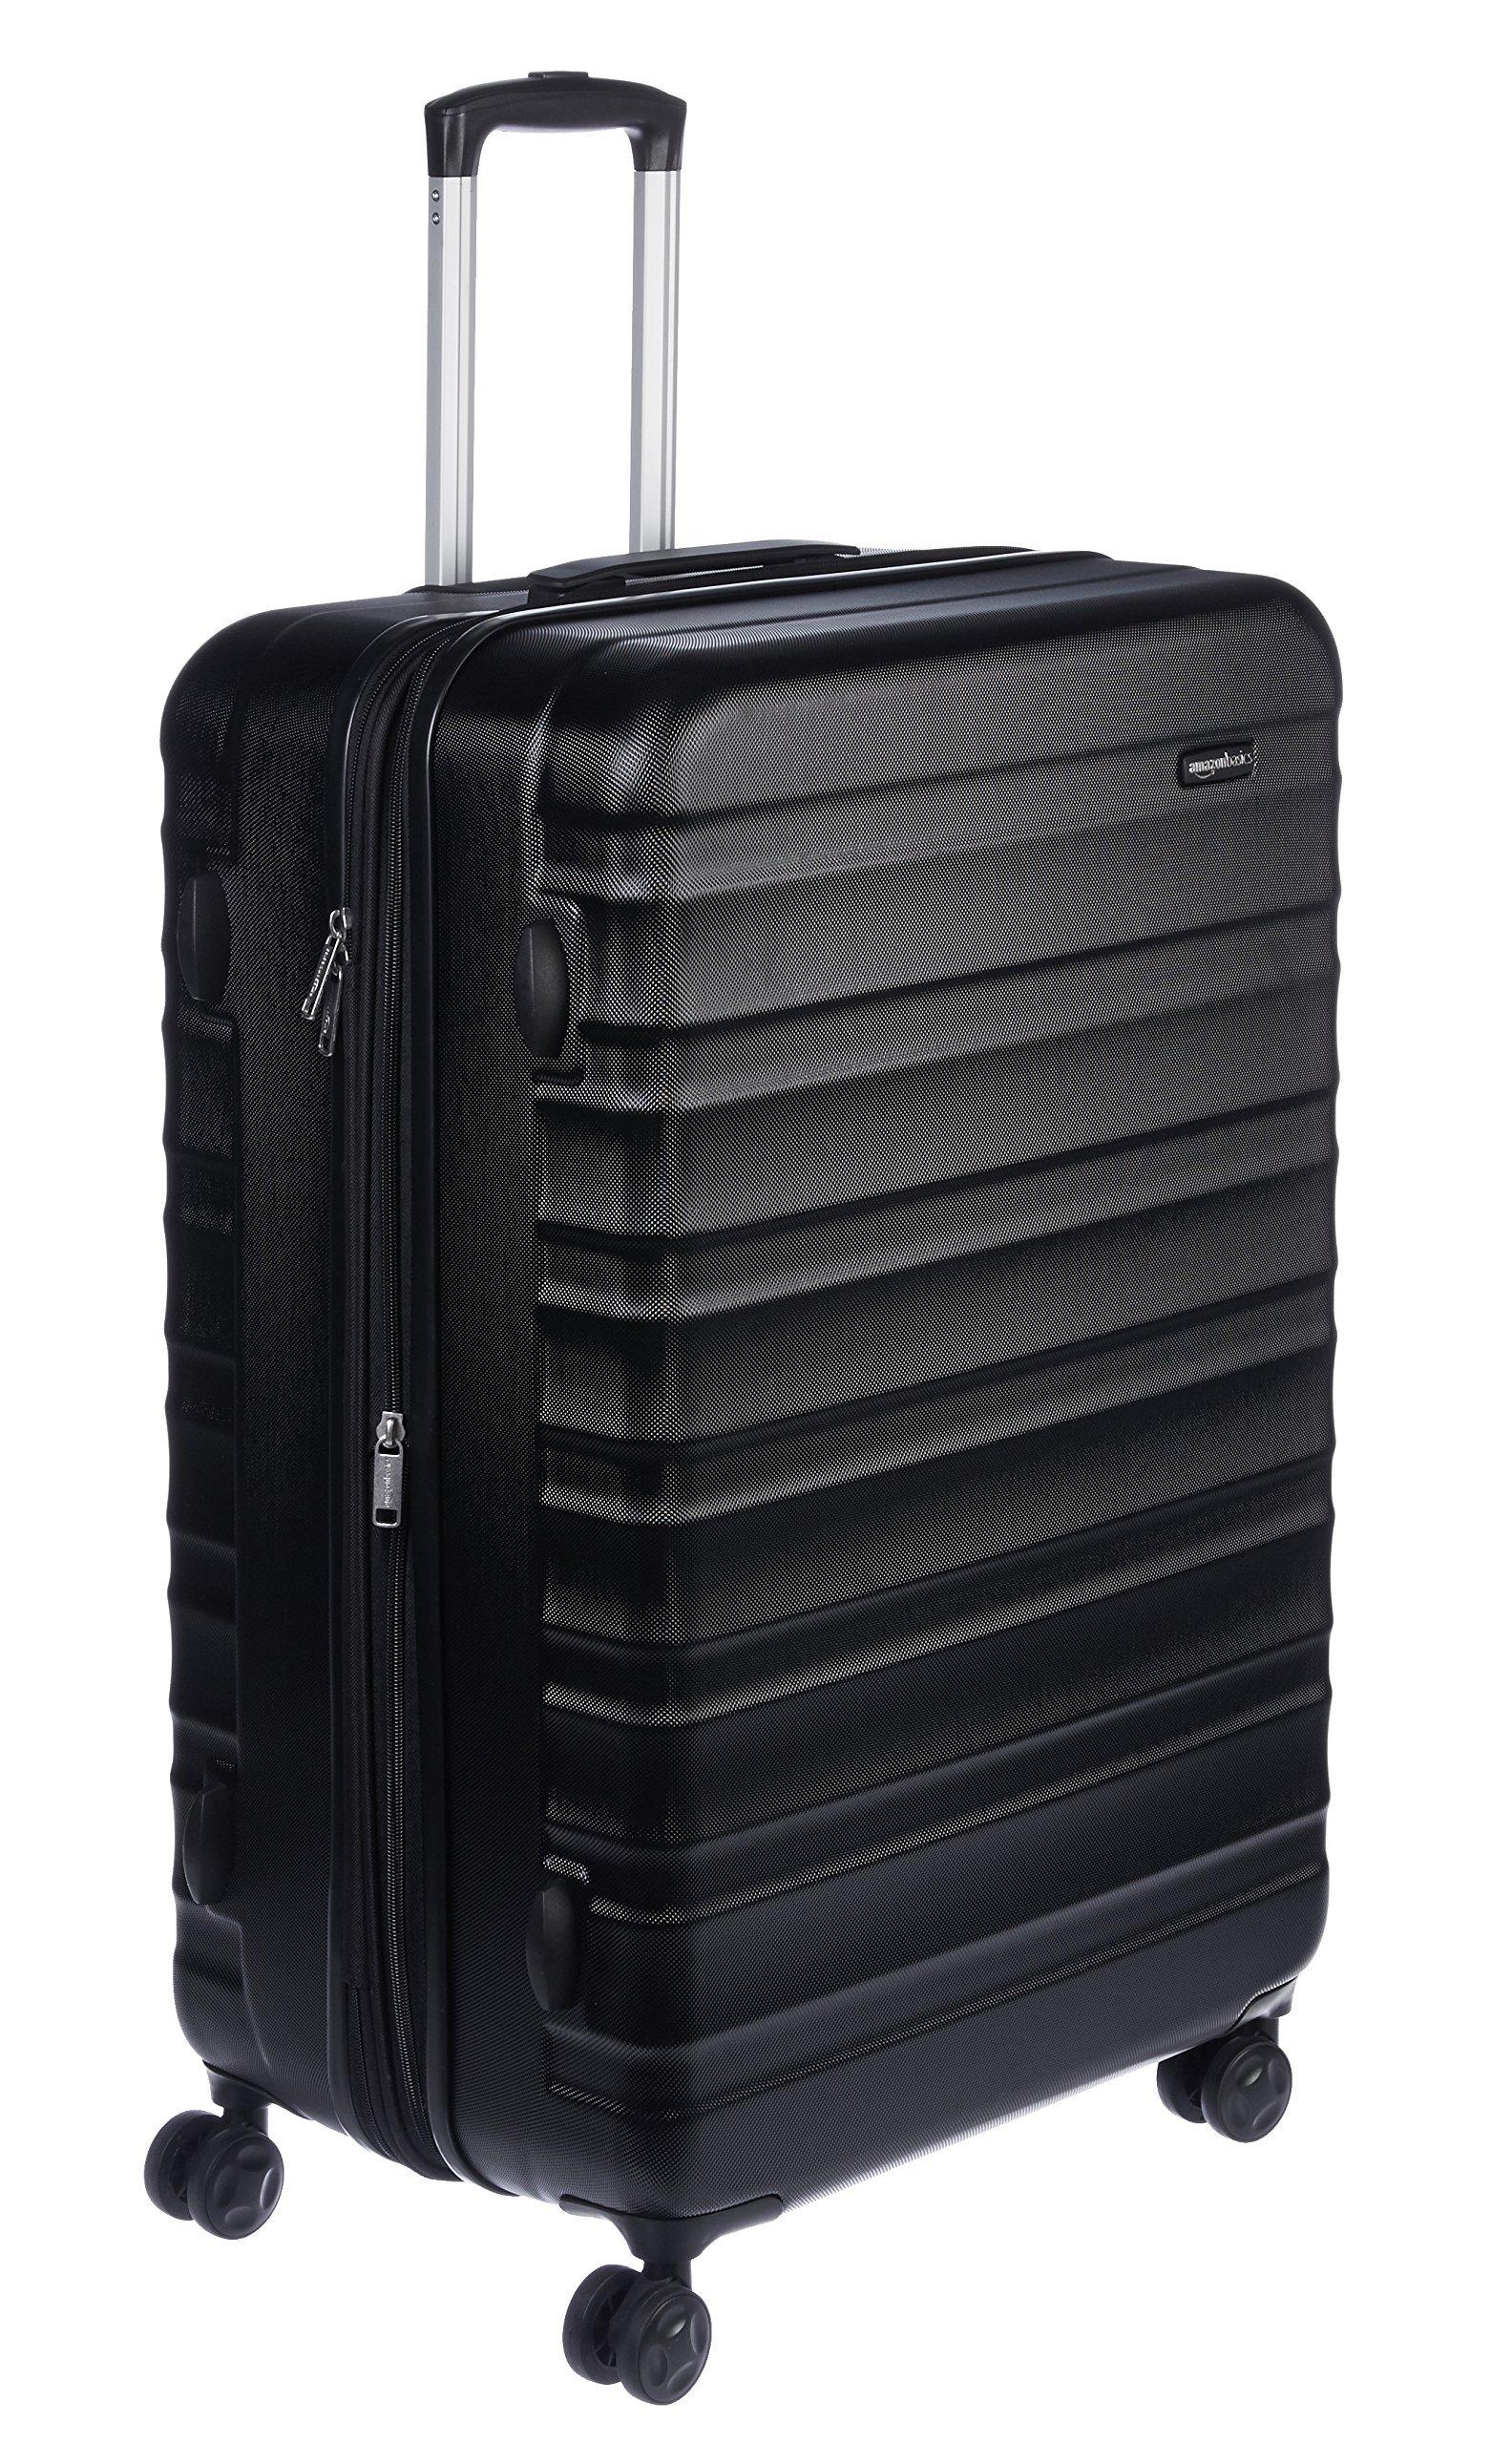 AmazonBasics - Maleta de viaje rígidaa giratoria - 78 cm, grande, Negro product image